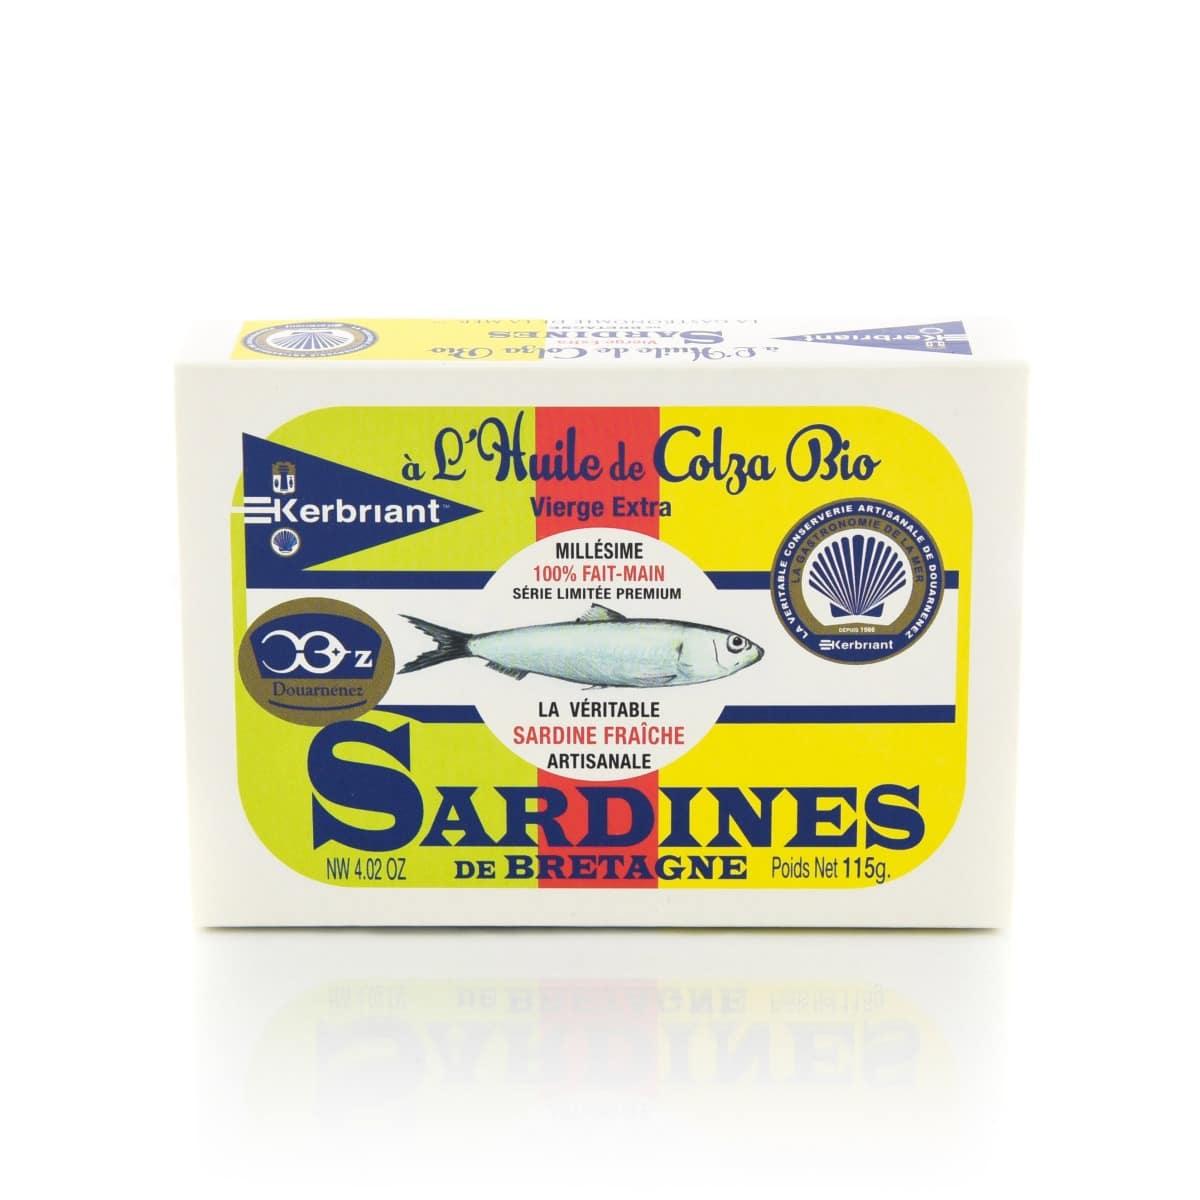 https://www.kerbriant.fr/wp-content/uploads/2012/02/Sardines_Huile_Colza_Bio_Kerbriant.jpg